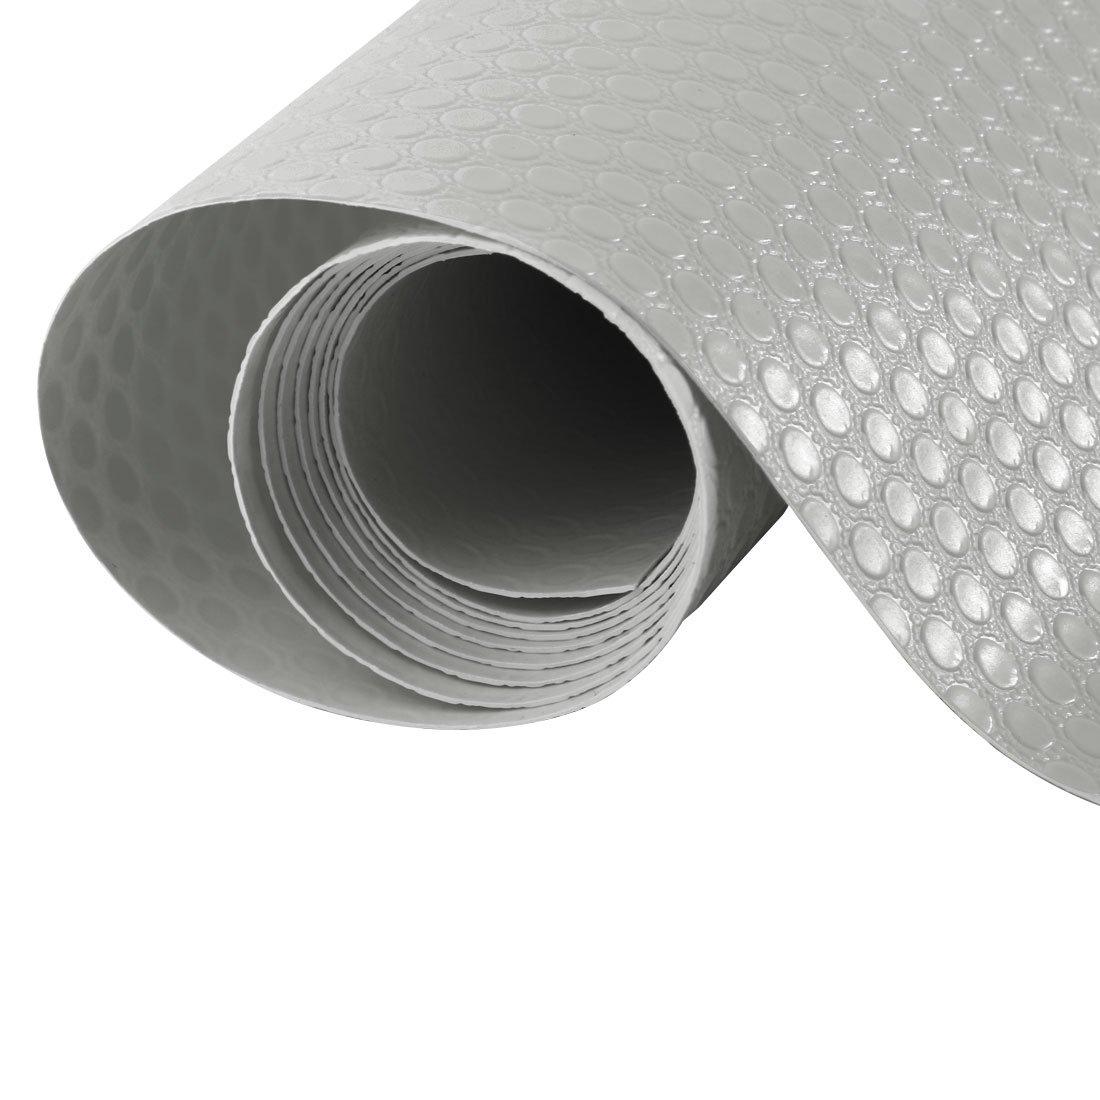 /Mesa de cocina armario caj/ón de papel estante maletero alfombrilla forro Pad Protector 50x100 cm gris Sourcingmap/ /Non/